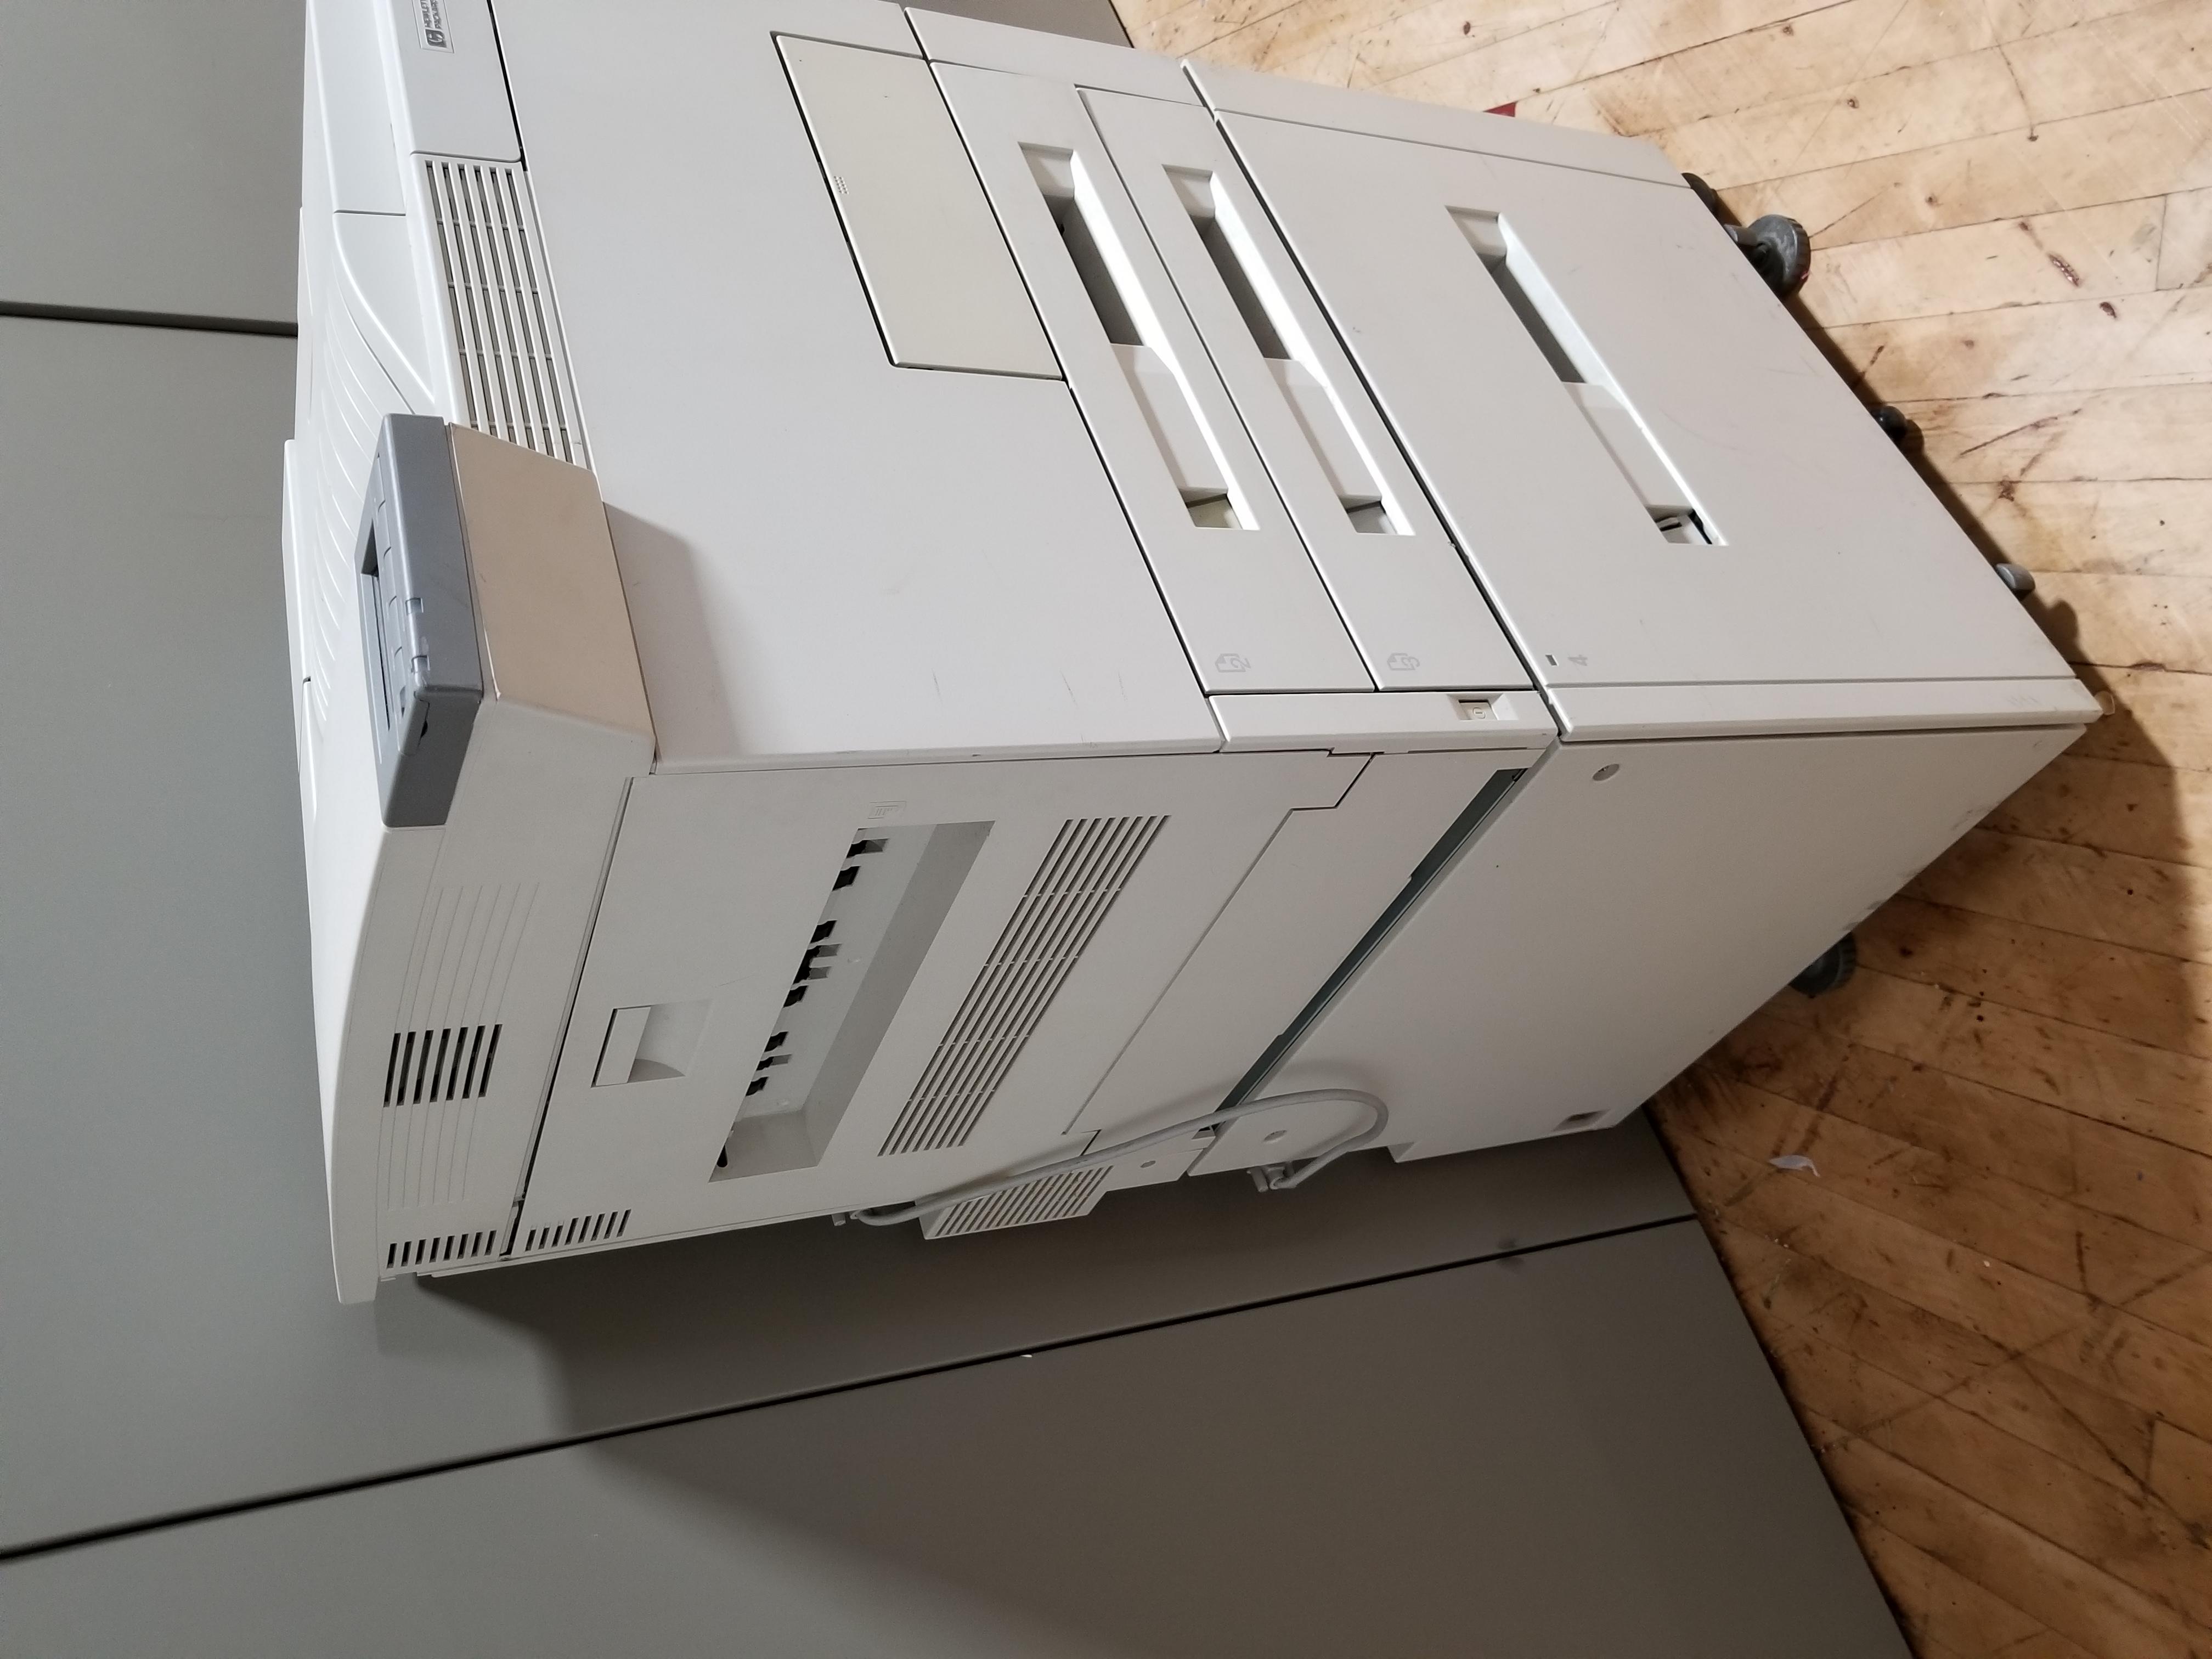 #110A. Office Printer